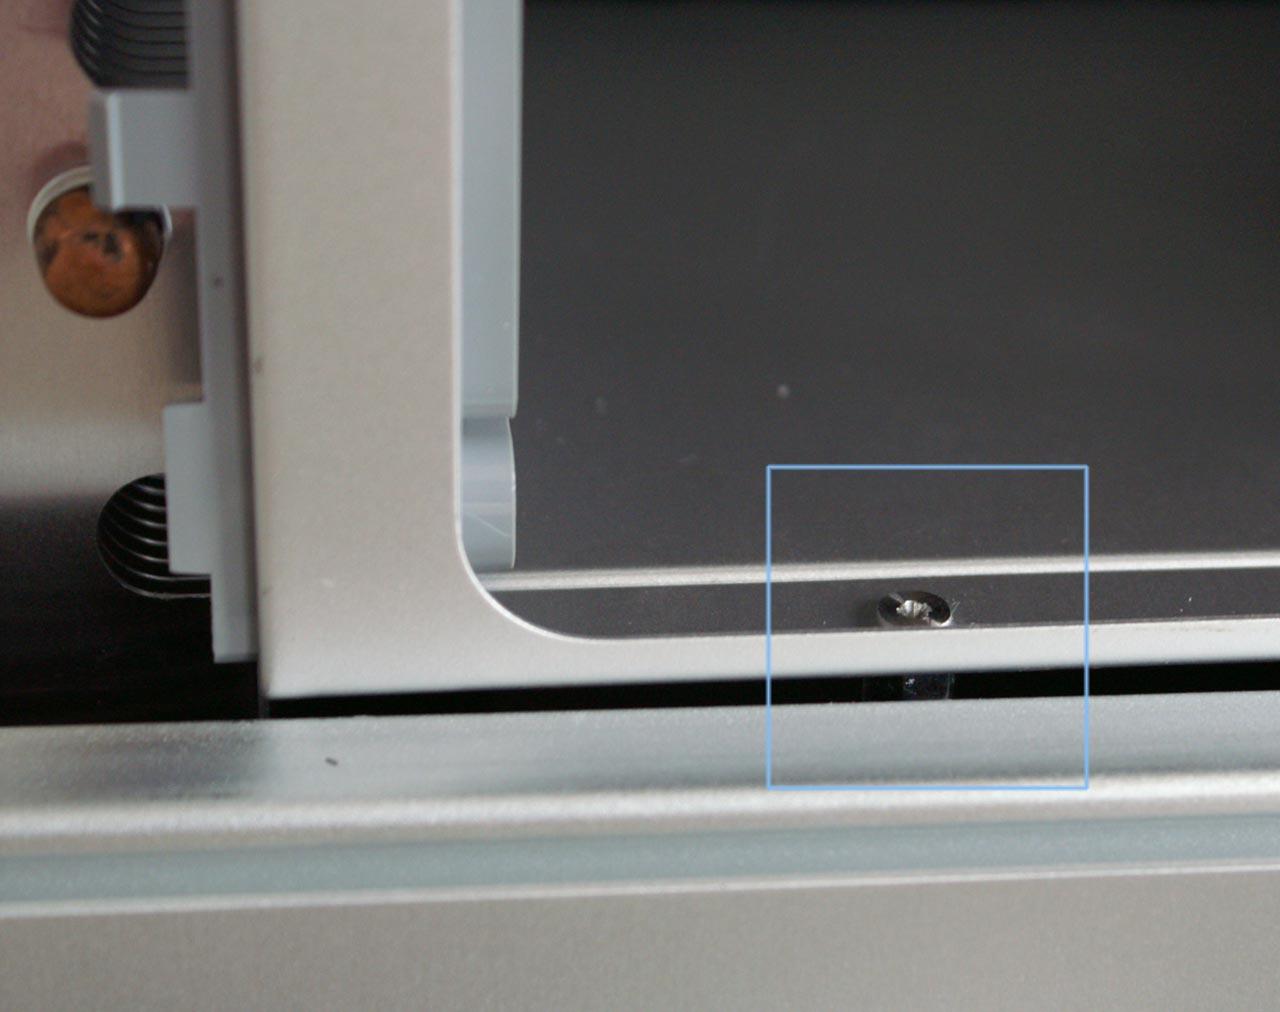 Taking it Apart - Apple's Mac Pro - A True PowerMac Successor